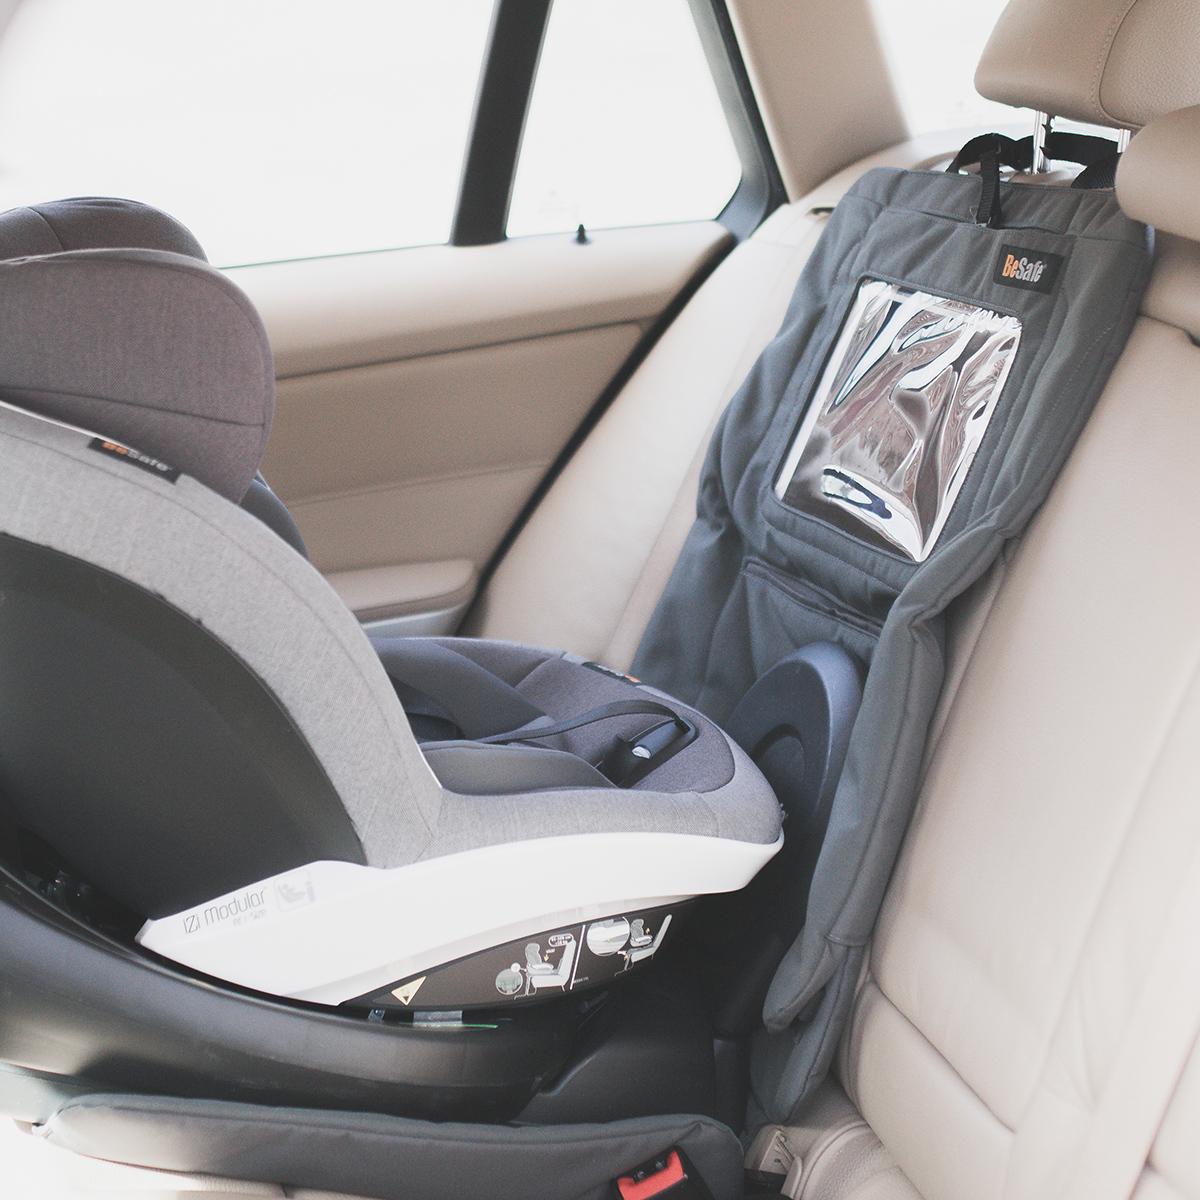 besafe protection pour dossier de si ge de voiture. Black Bedroom Furniture Sets. Home Design Ideas